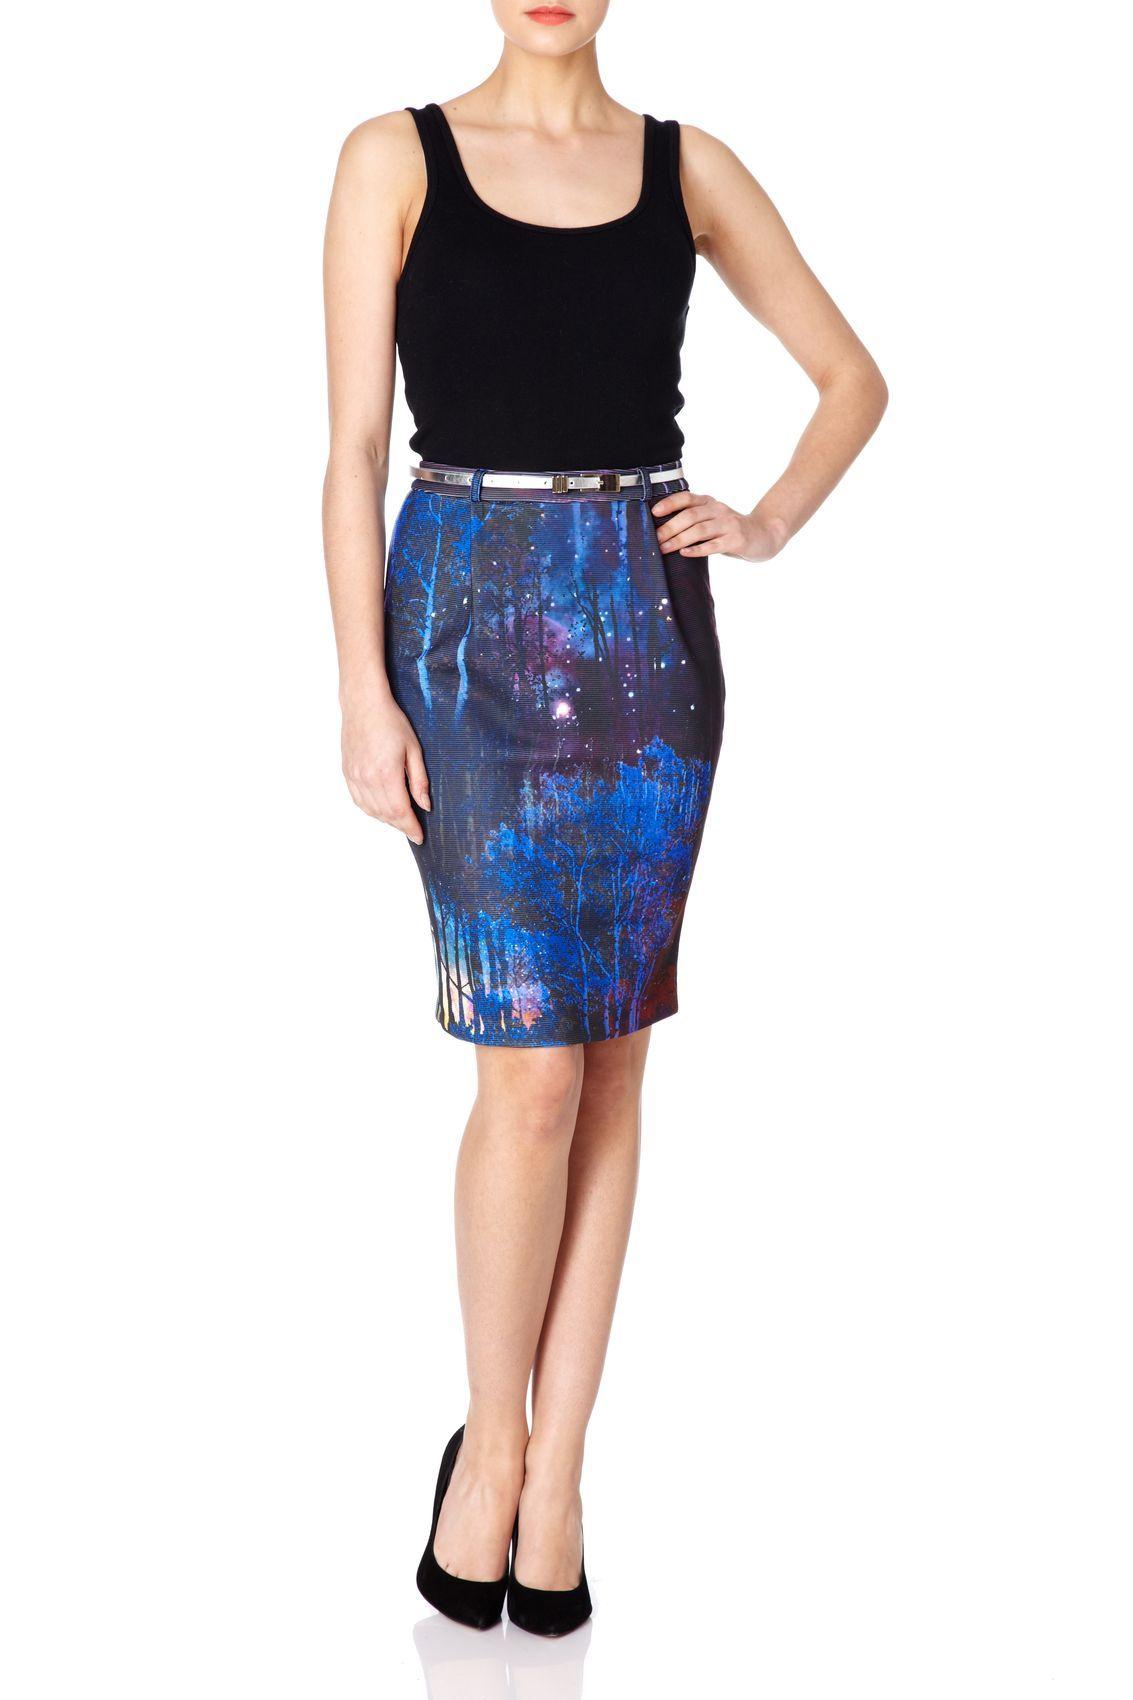 Starlight Tress Skirt #distantgalaxies #yumi #cosmic